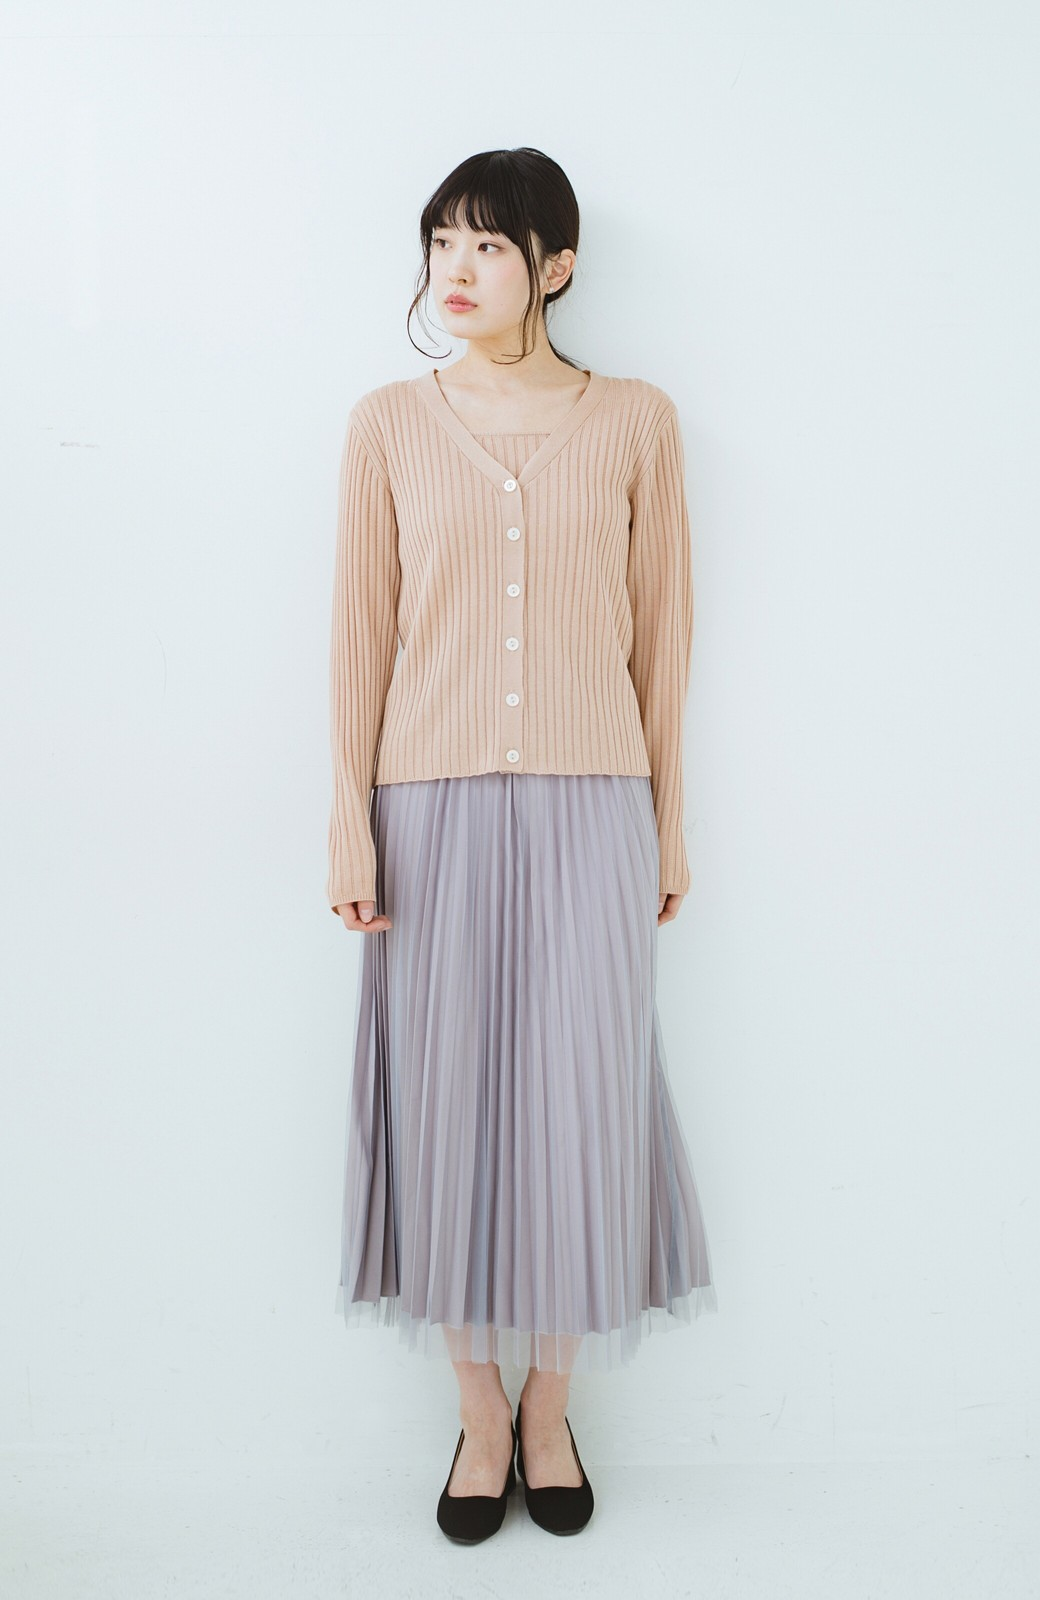 haco! どんな日も華やか気分にしてくれる 二枚仕立てのチュールプリーツスカート <ライトグレー>の商品写真15